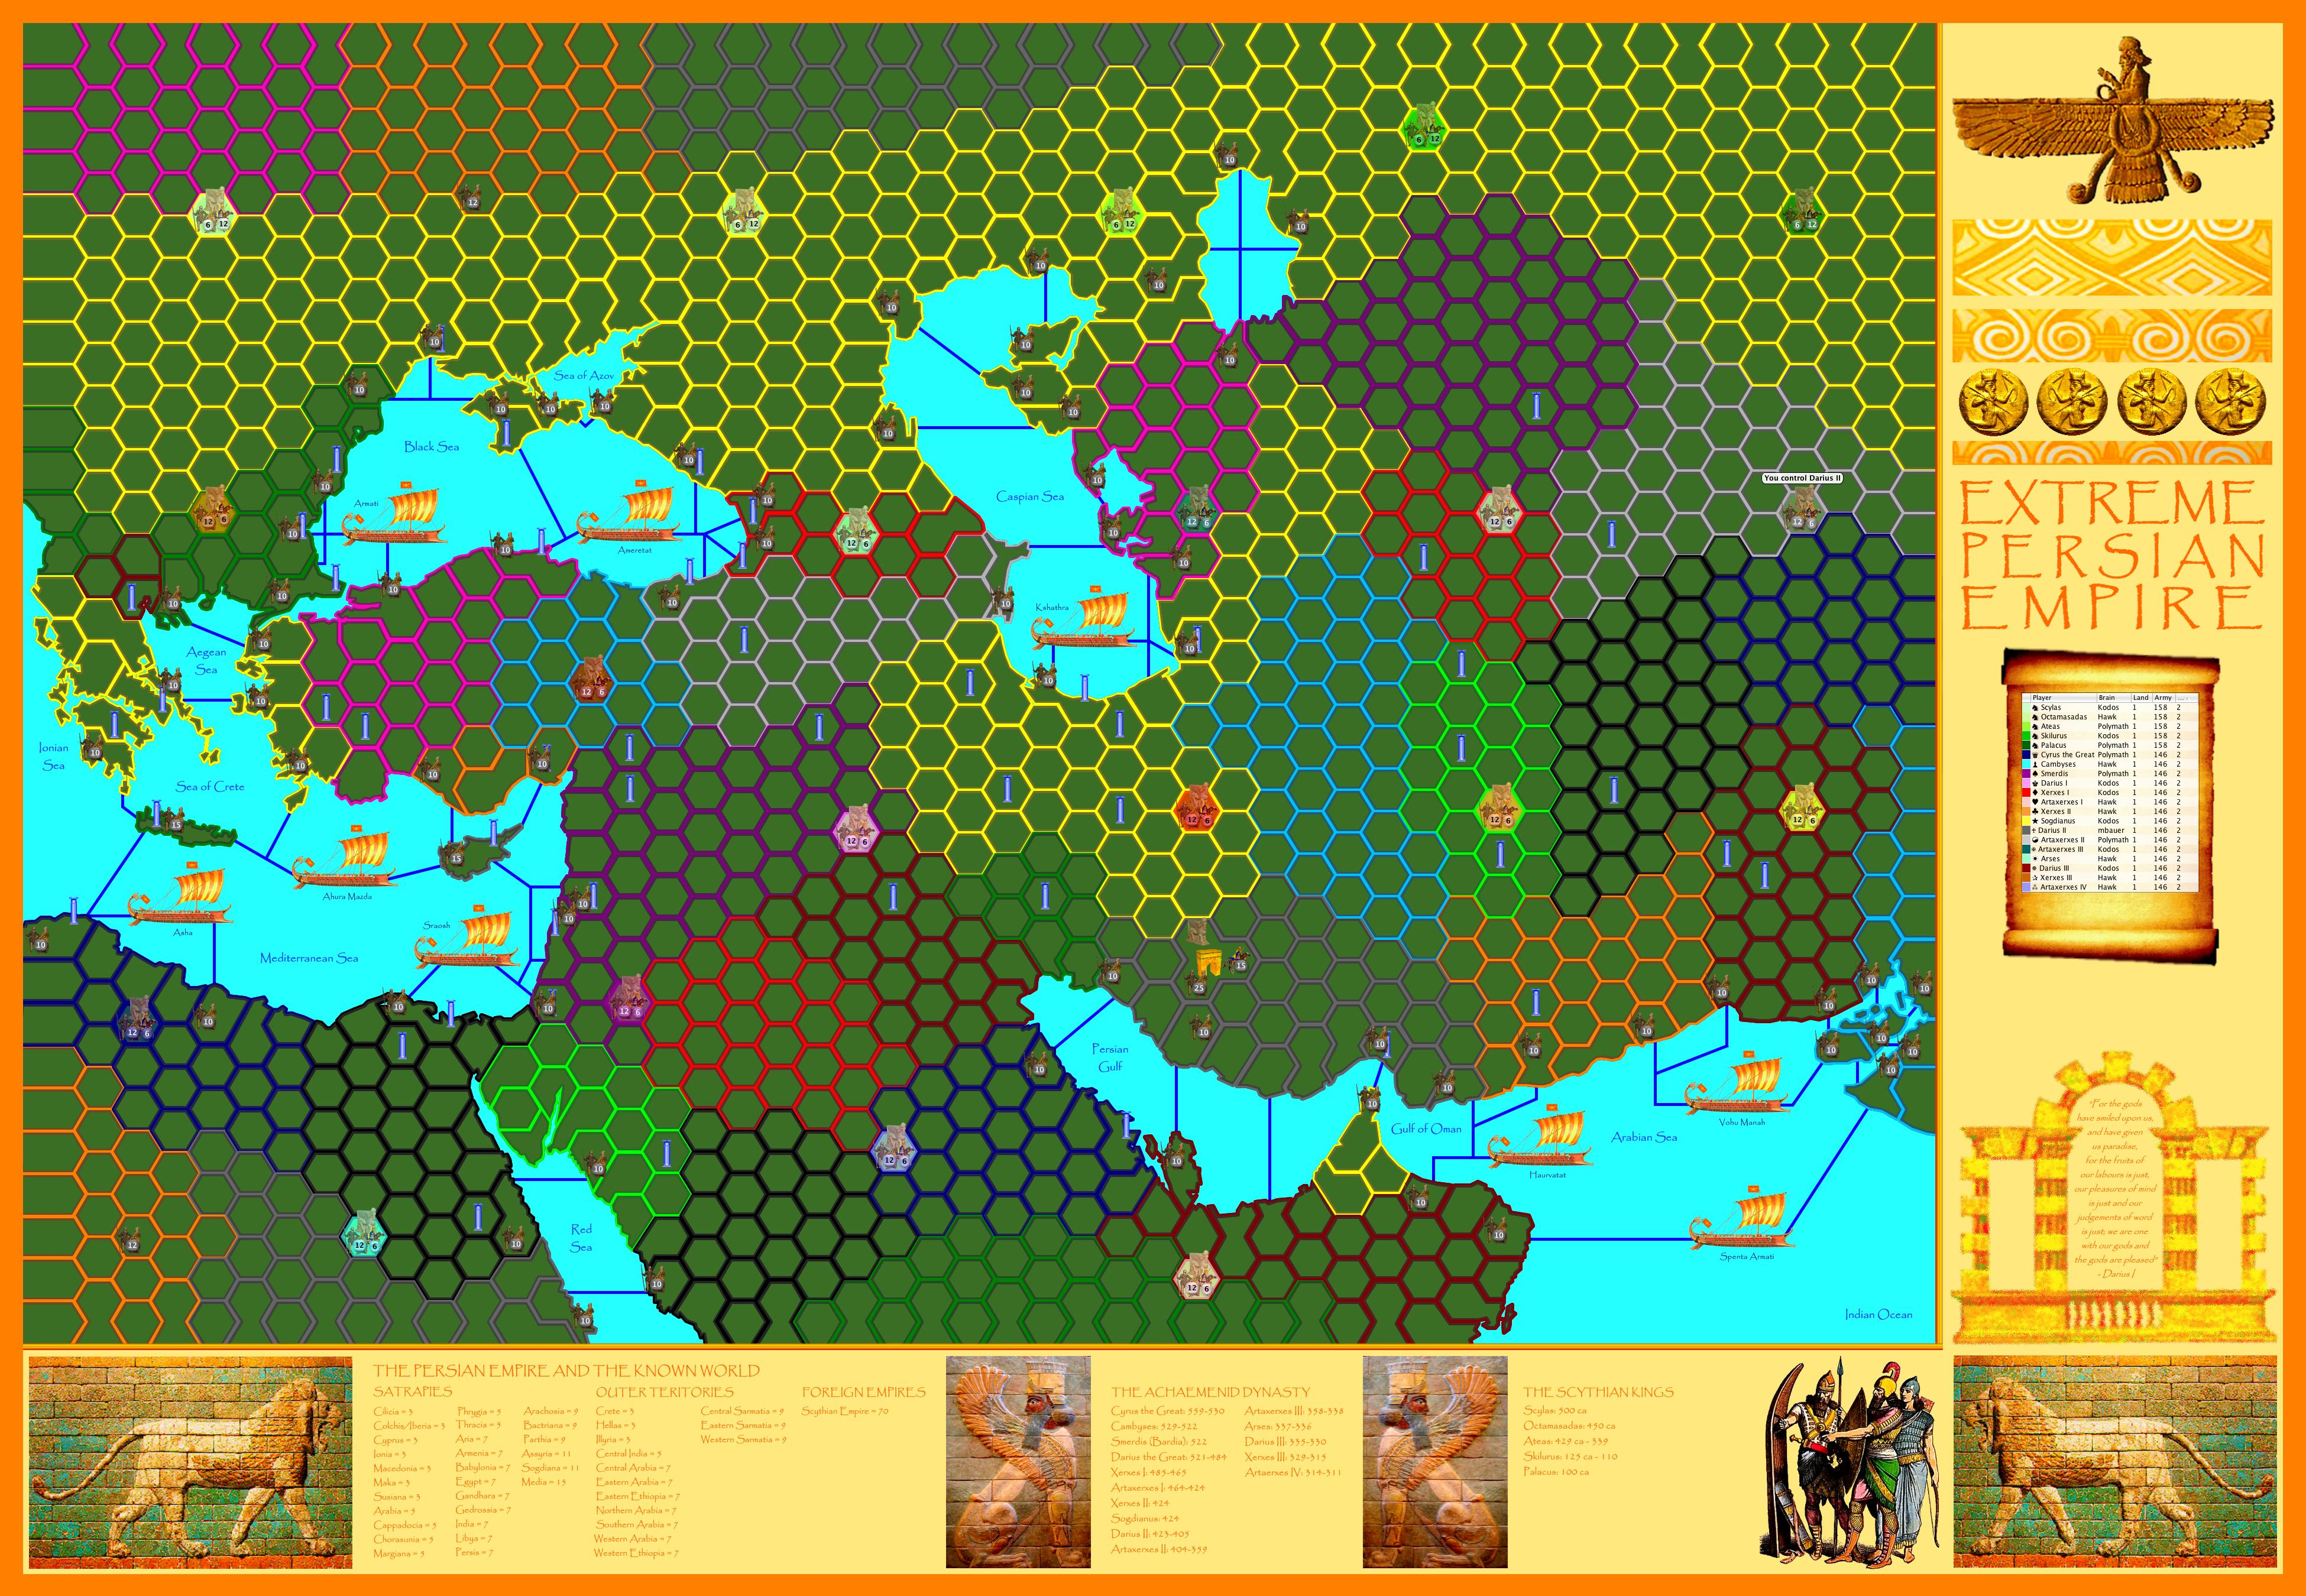 Extreme Persian Empire Map - Persian empire map